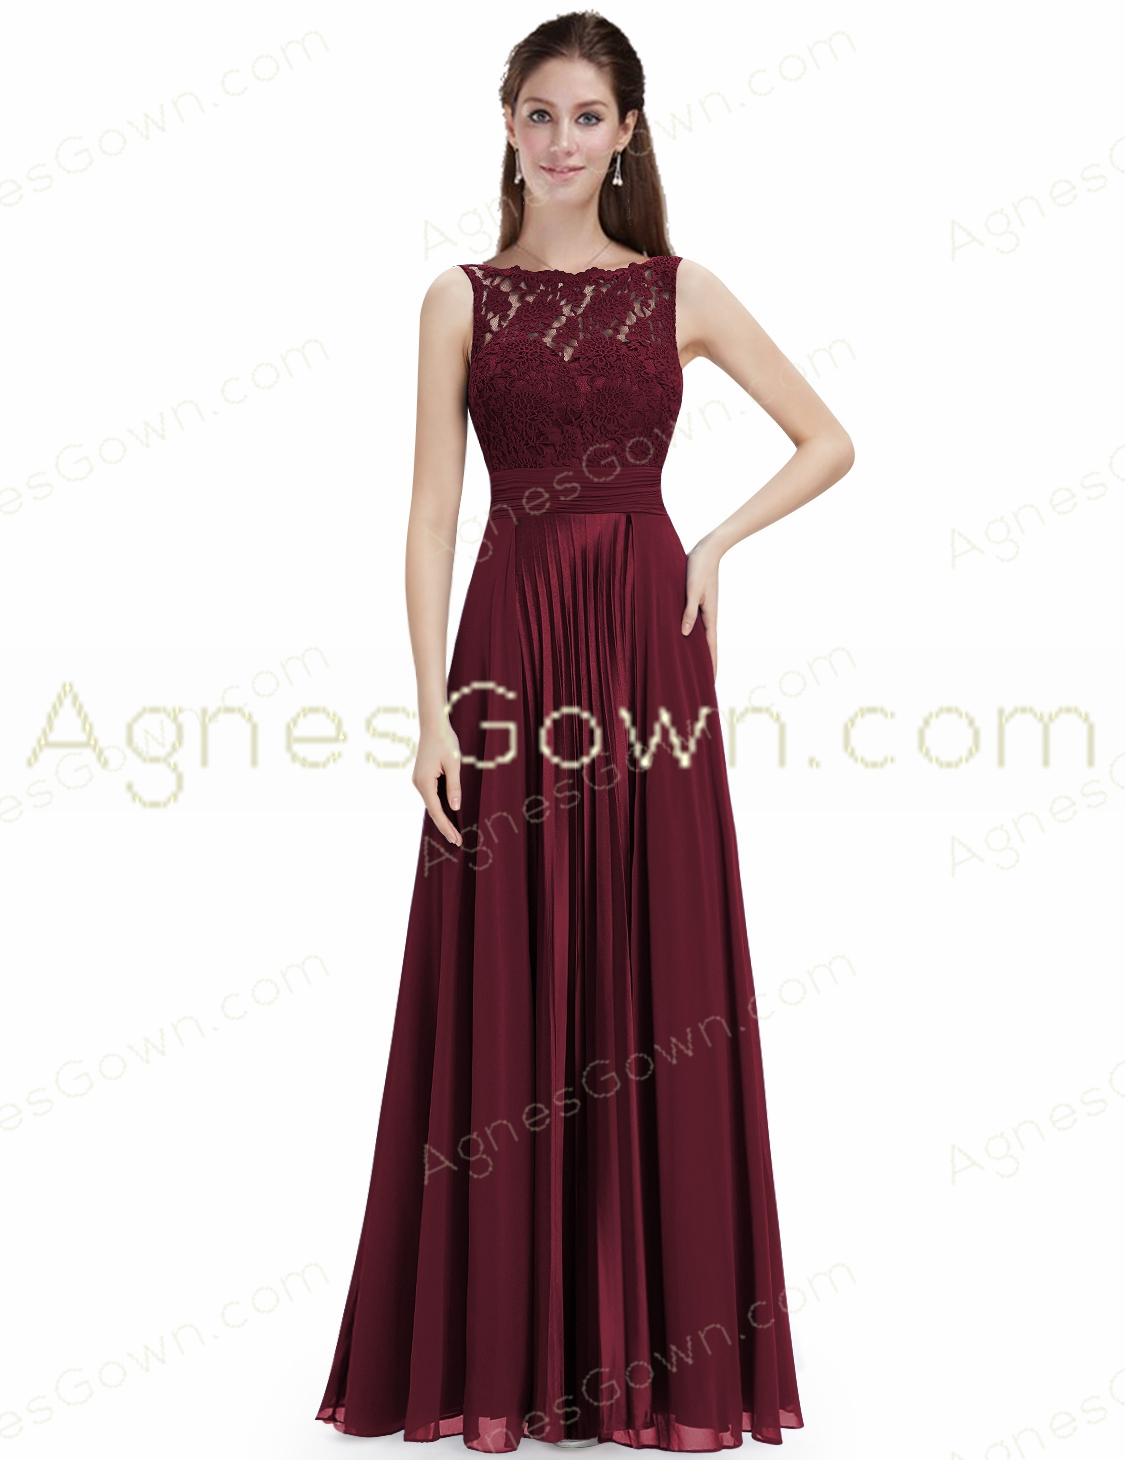 Bateau Neckline Burgundy Sleeveless Engagement Dress